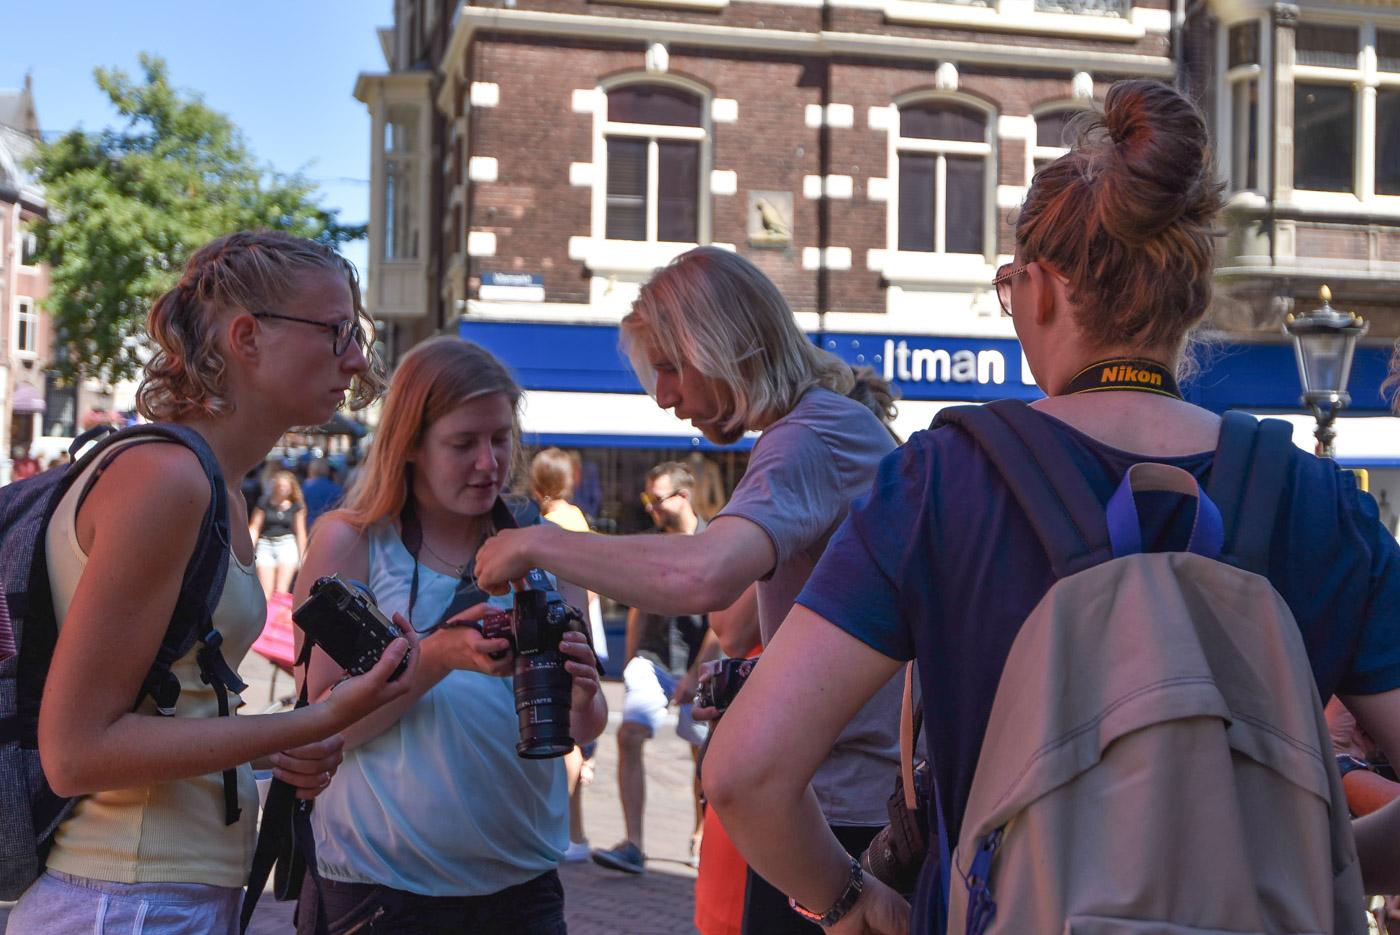 reisfotografie workshop utrecht centrum groepje